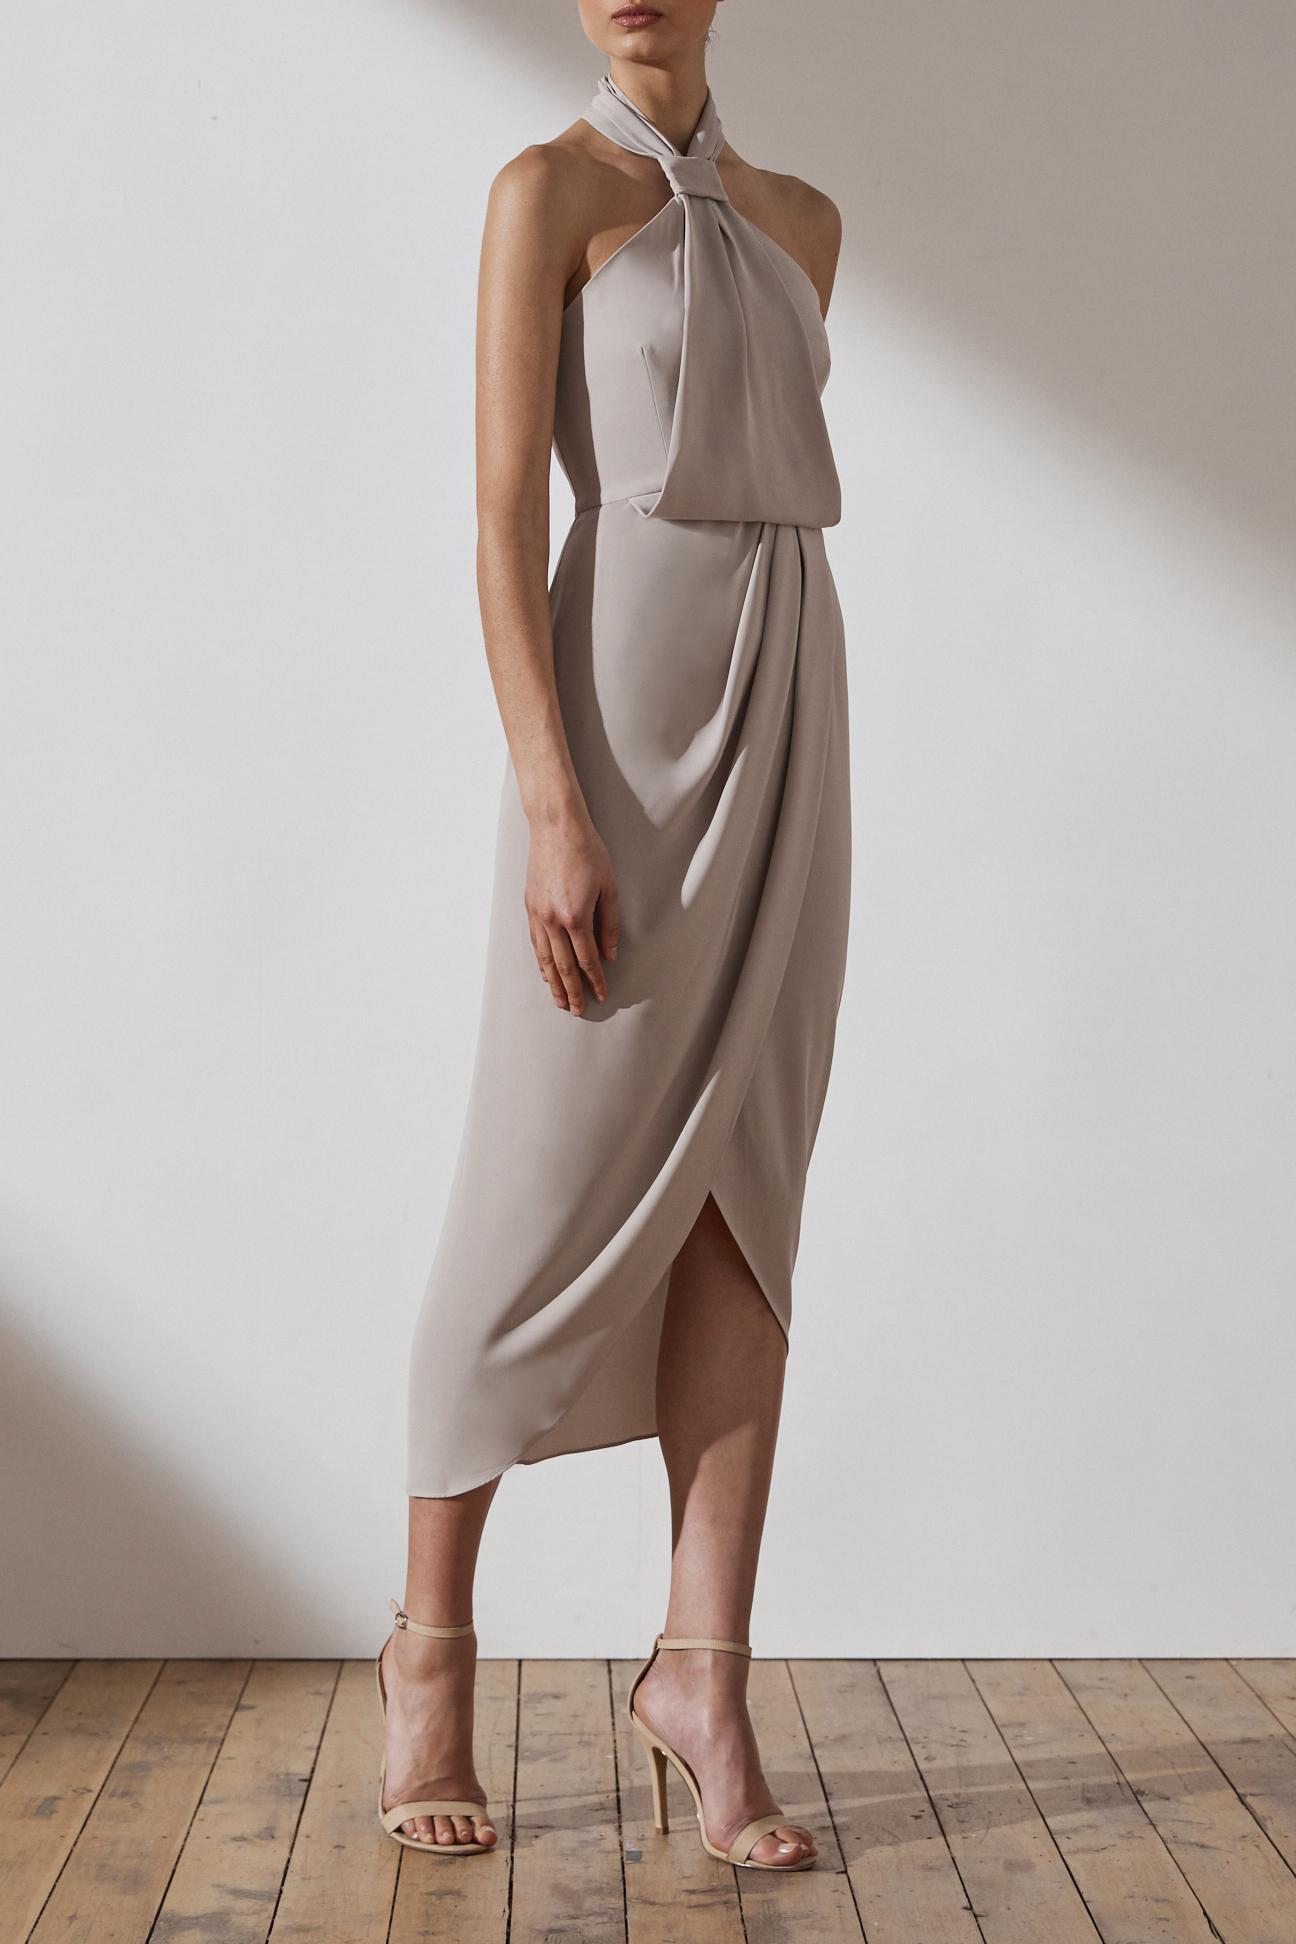 Shona Joy Amanda Knot Dress